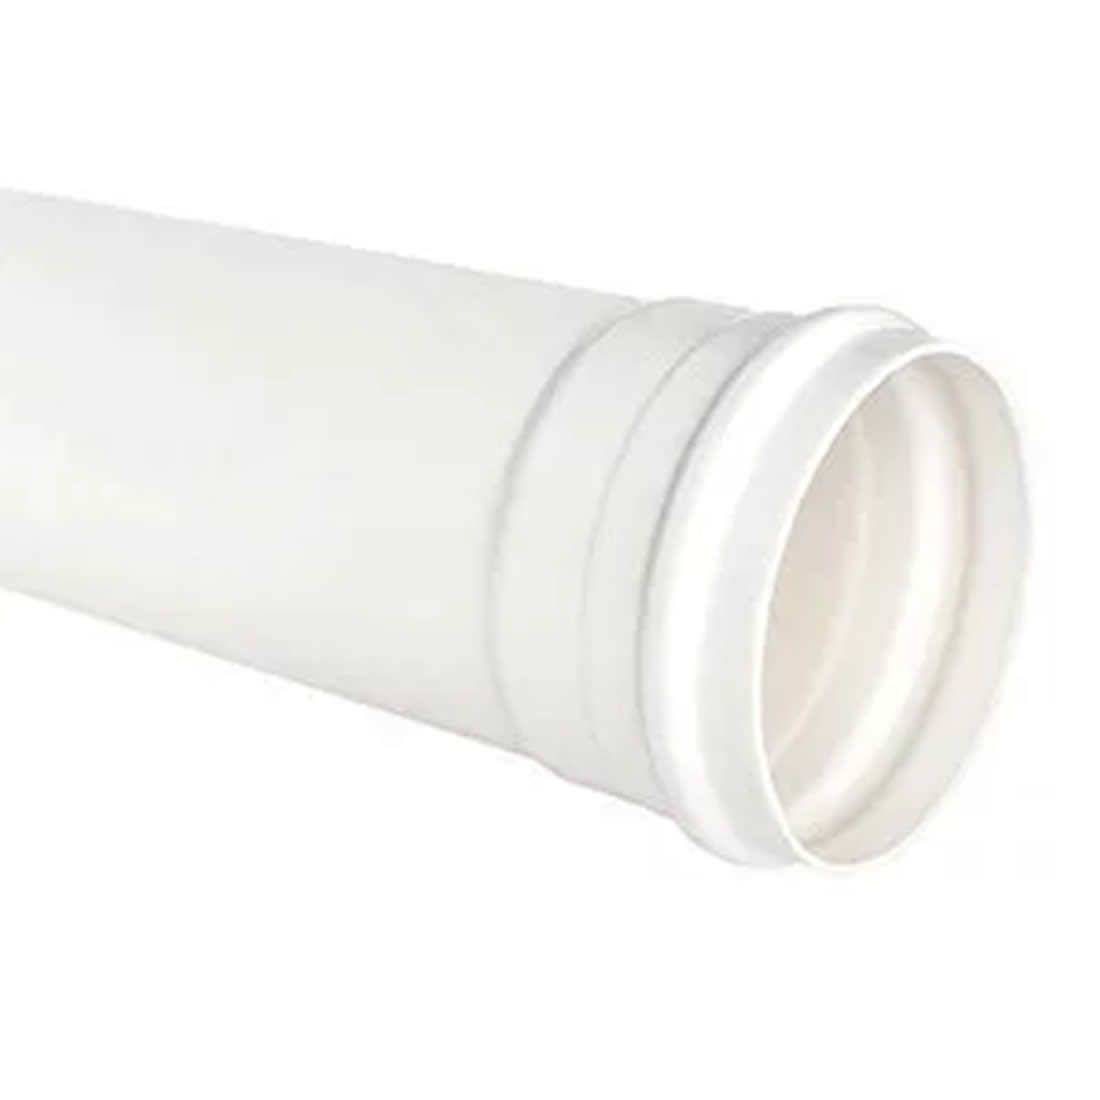 Tubo PVC Para Esgoto 75mm X 6 Metros Tigre